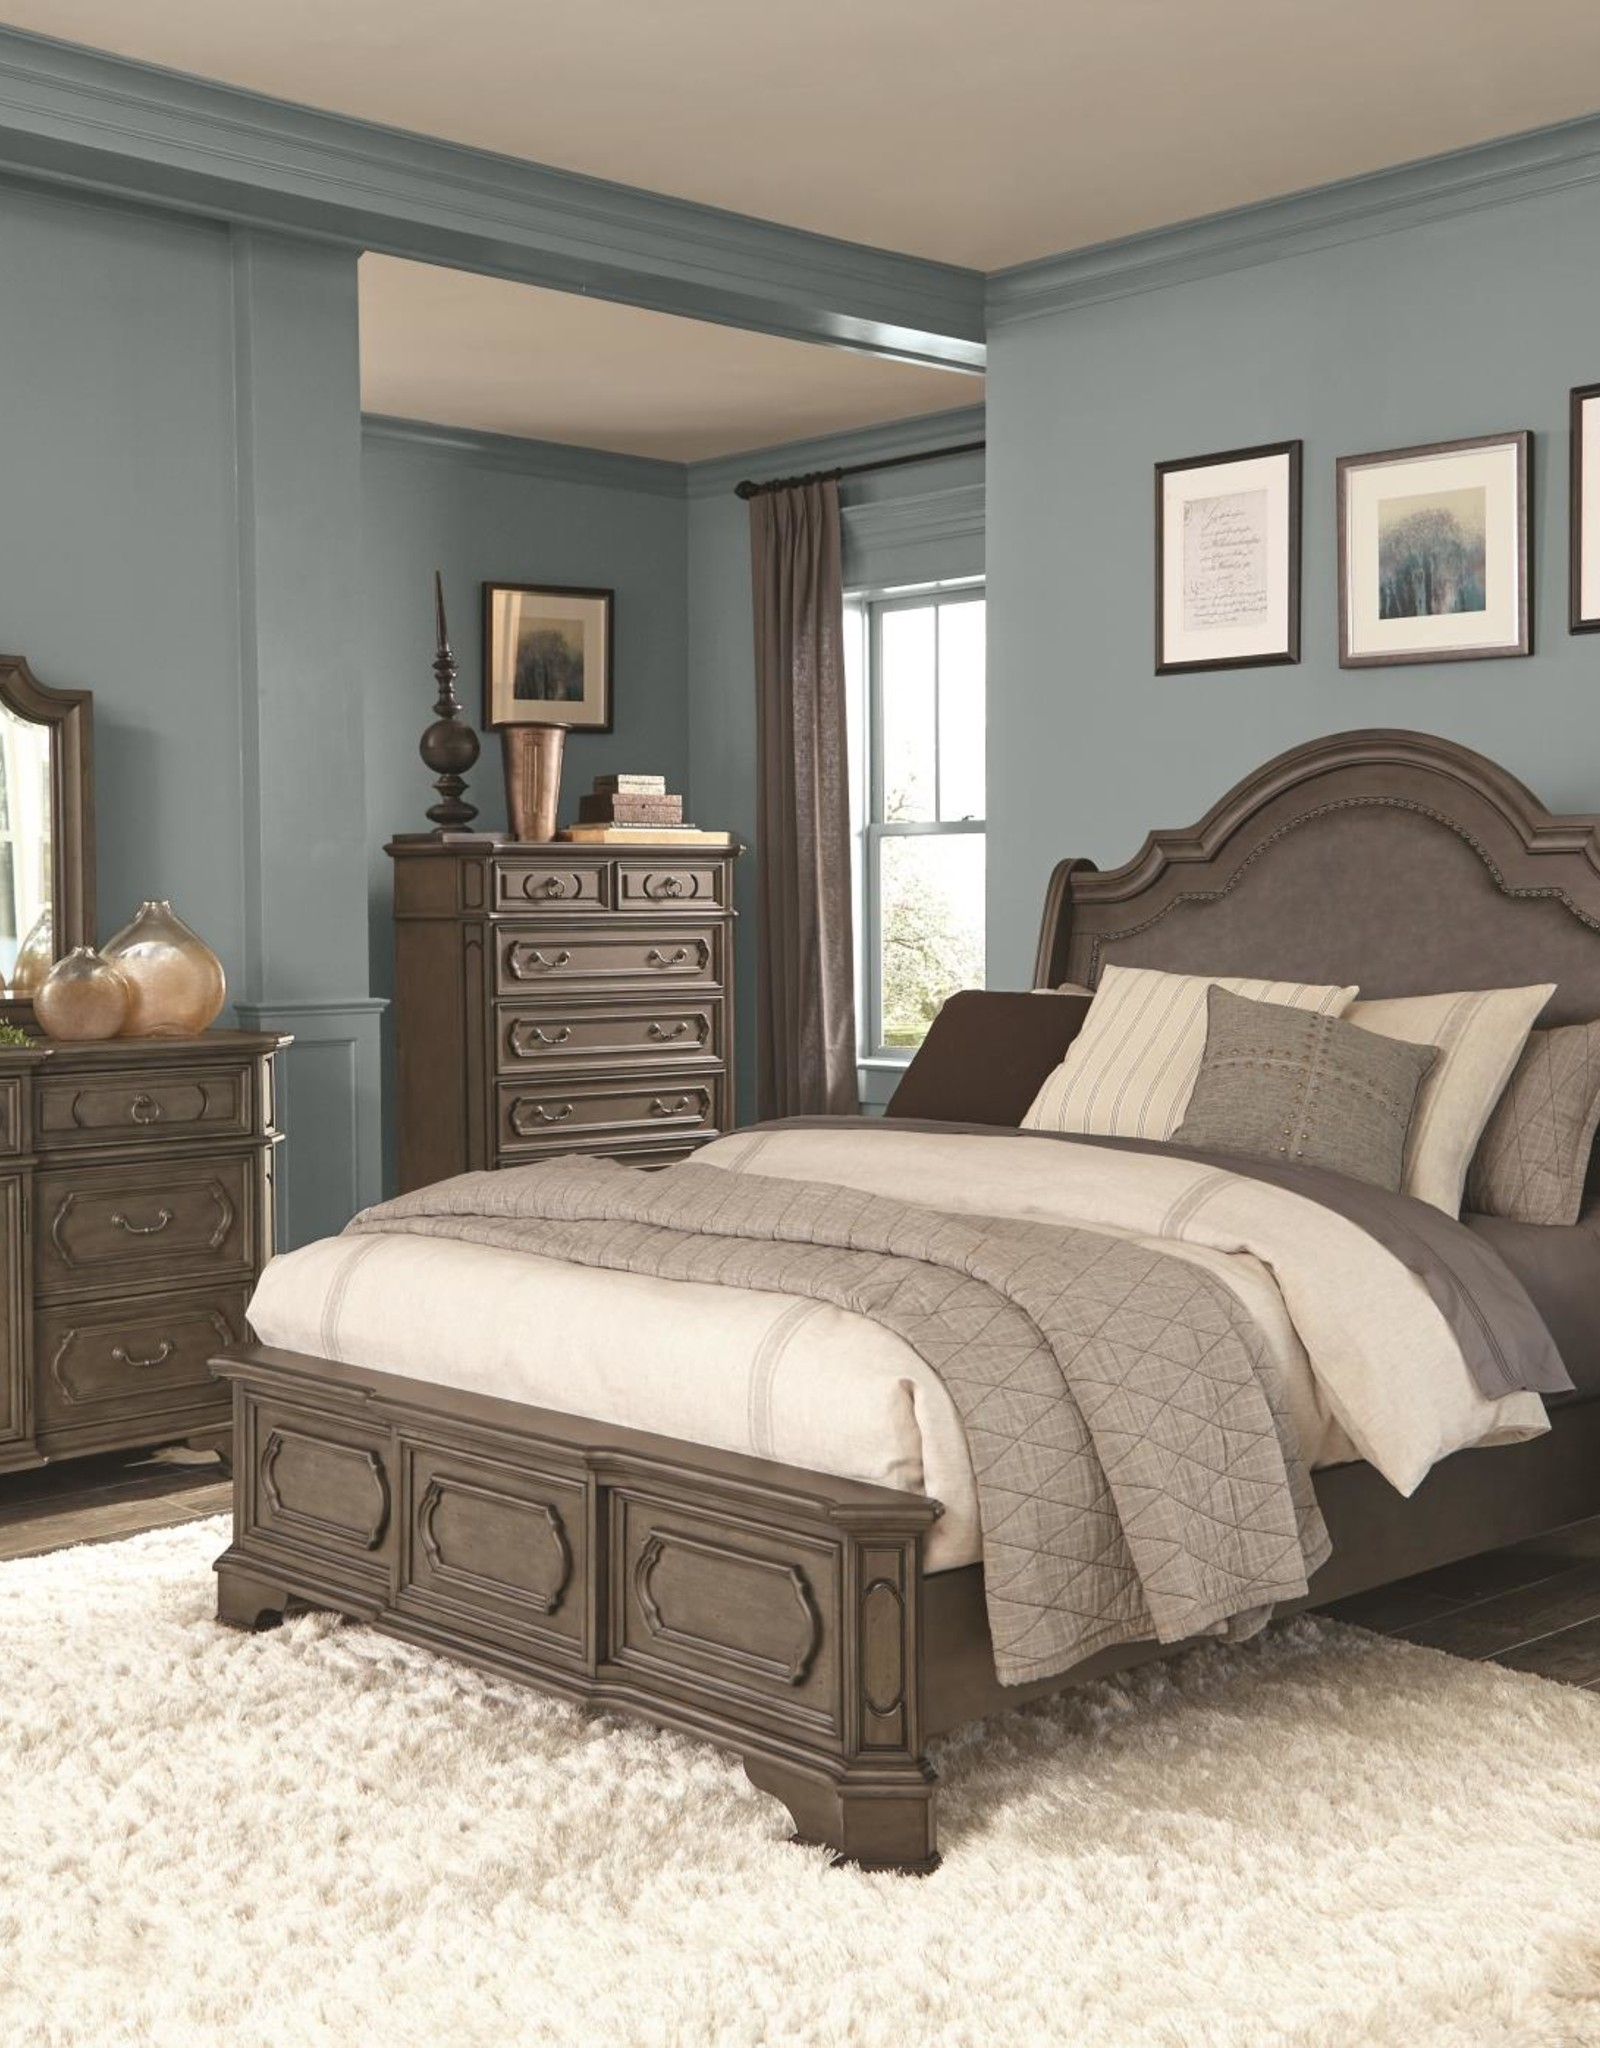 Kith Furniture Ballard Park Gray Queen Bed